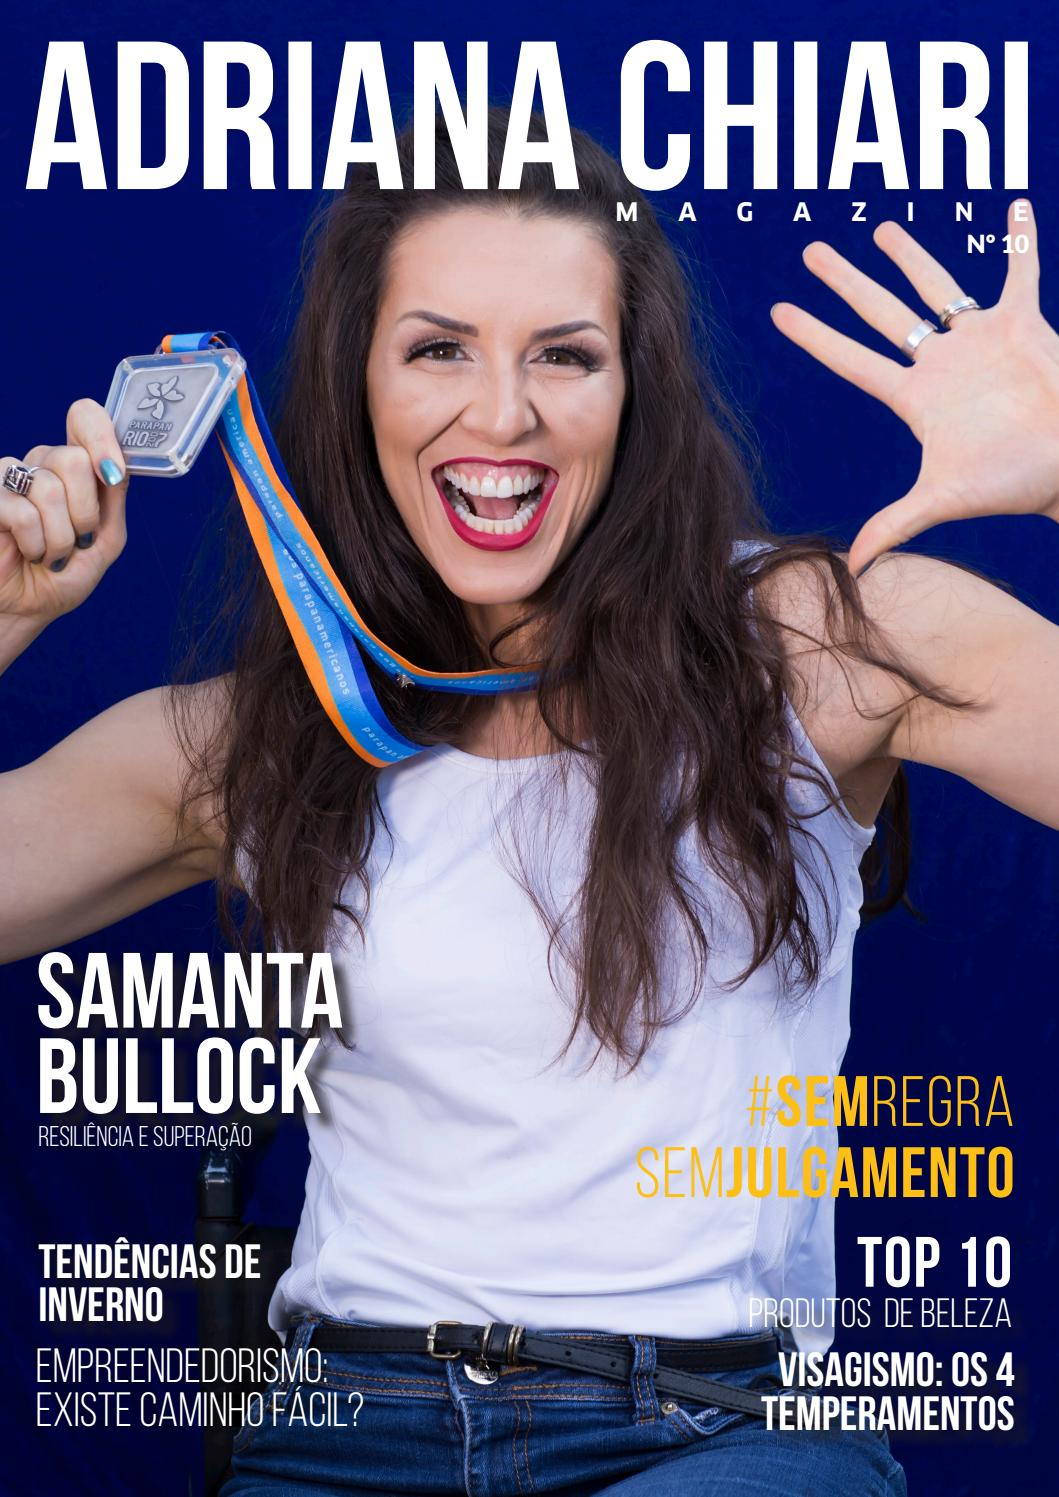 10ª Edição - Adriana Chiari Magazine